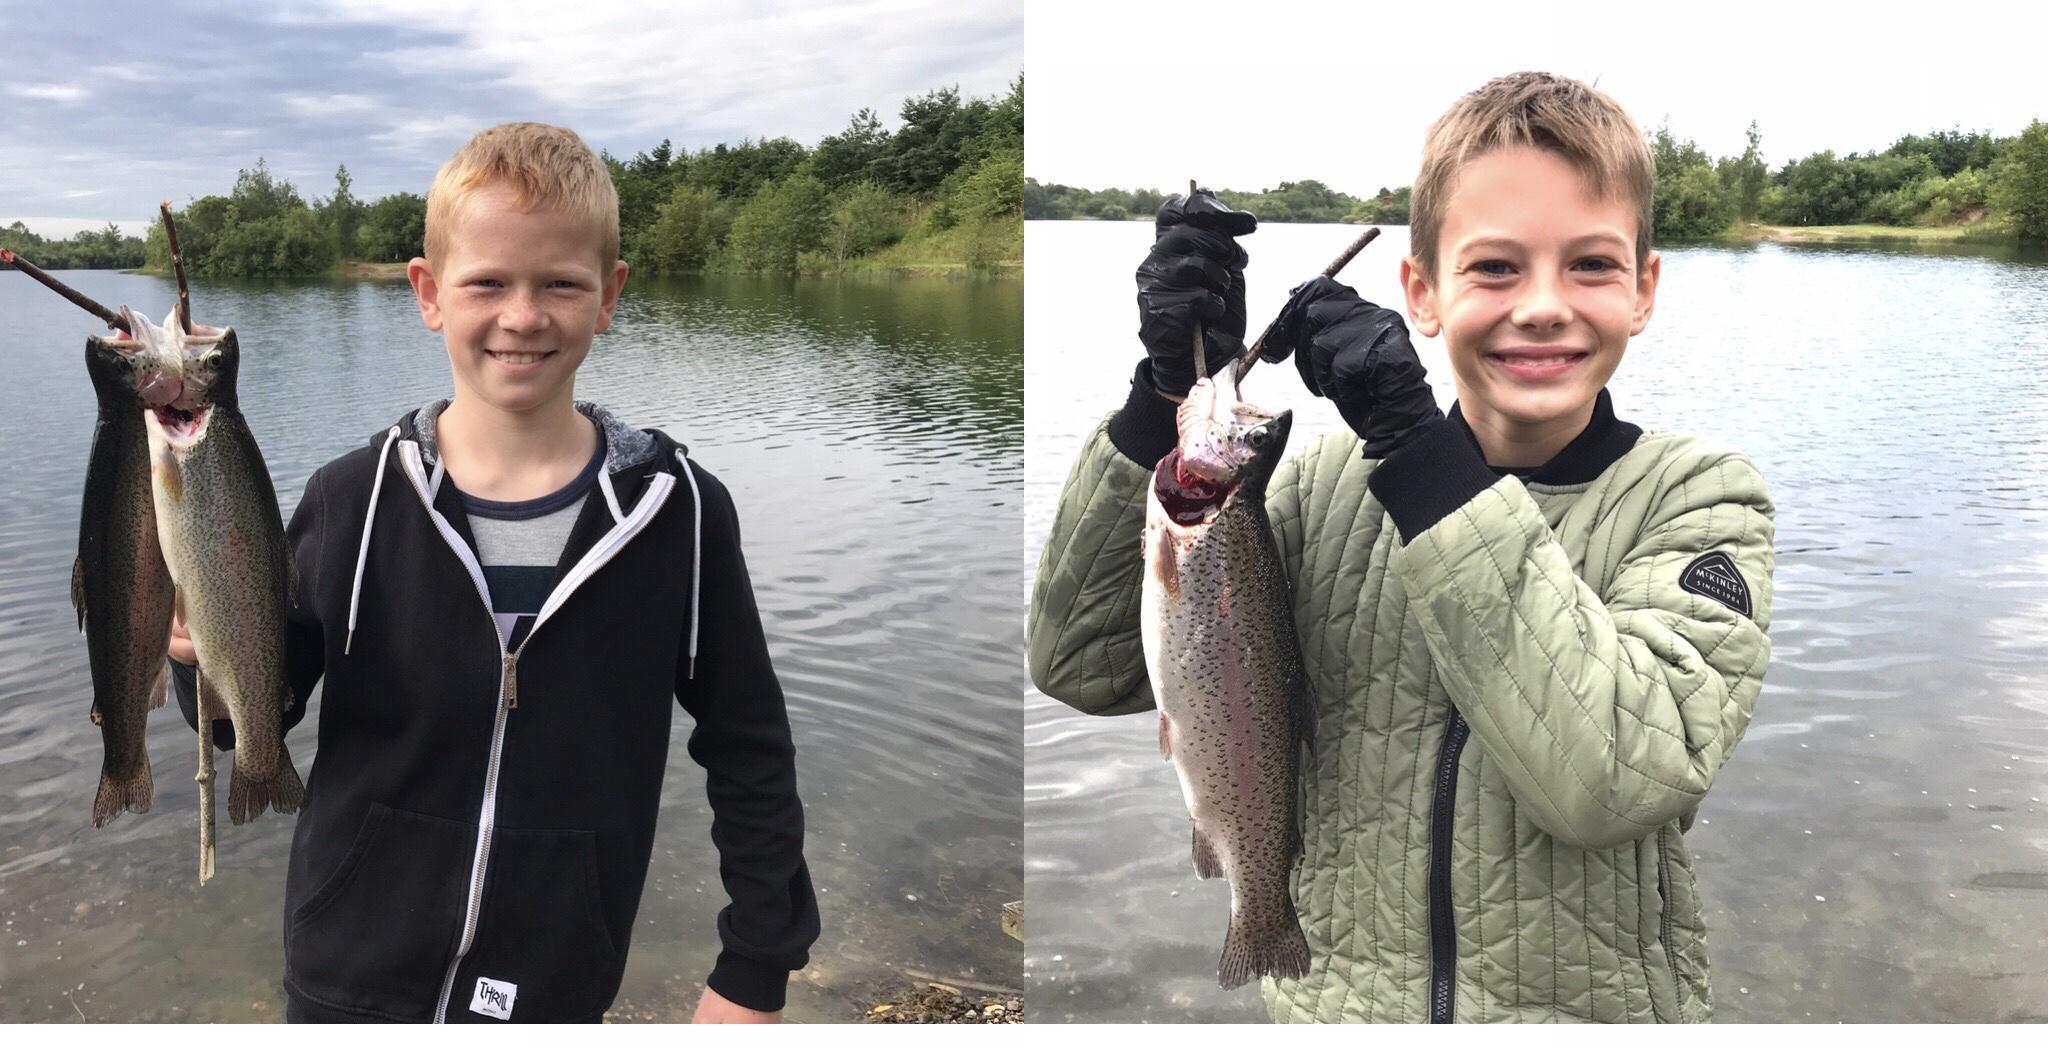 Mjøls Lystfiskeri: Benjamin og Matthias fangede aftensmaden